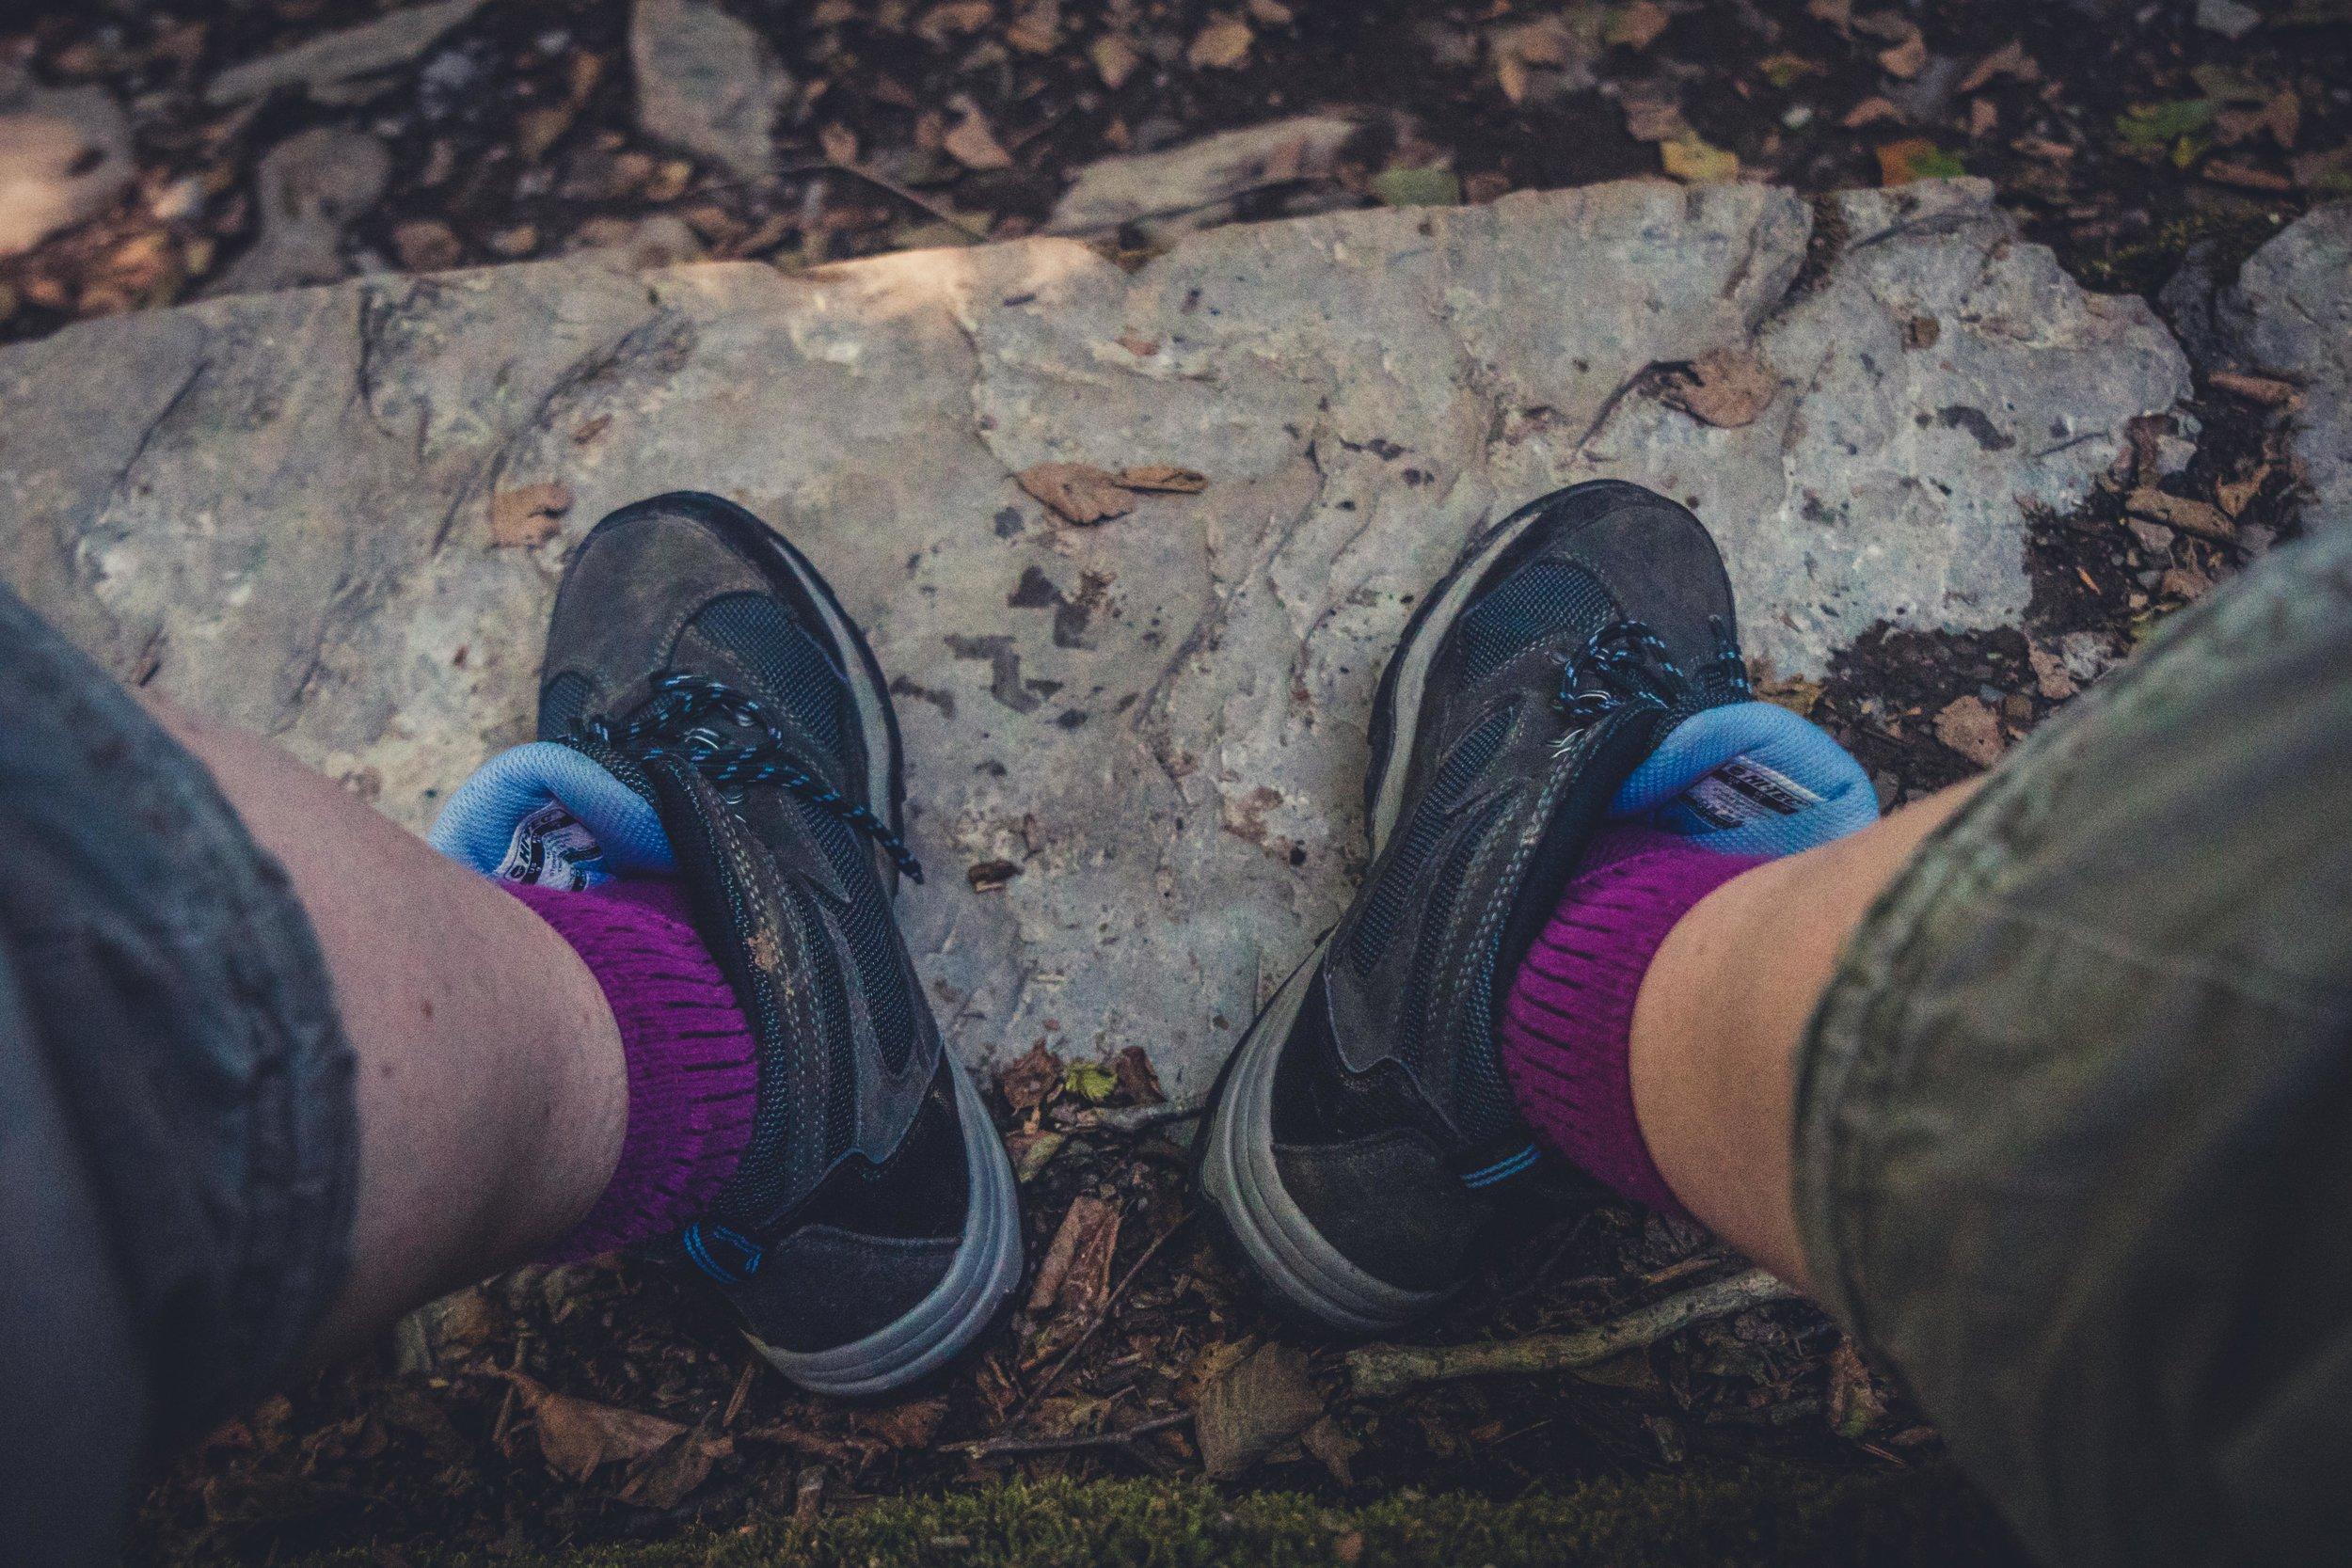 county cork. cork. ireland. irish. history. city. house sitting. old. travel. travel photography. travel photographer. lough hyne. hiking. outdoor. adventure. hiking. hi-tech.jpg